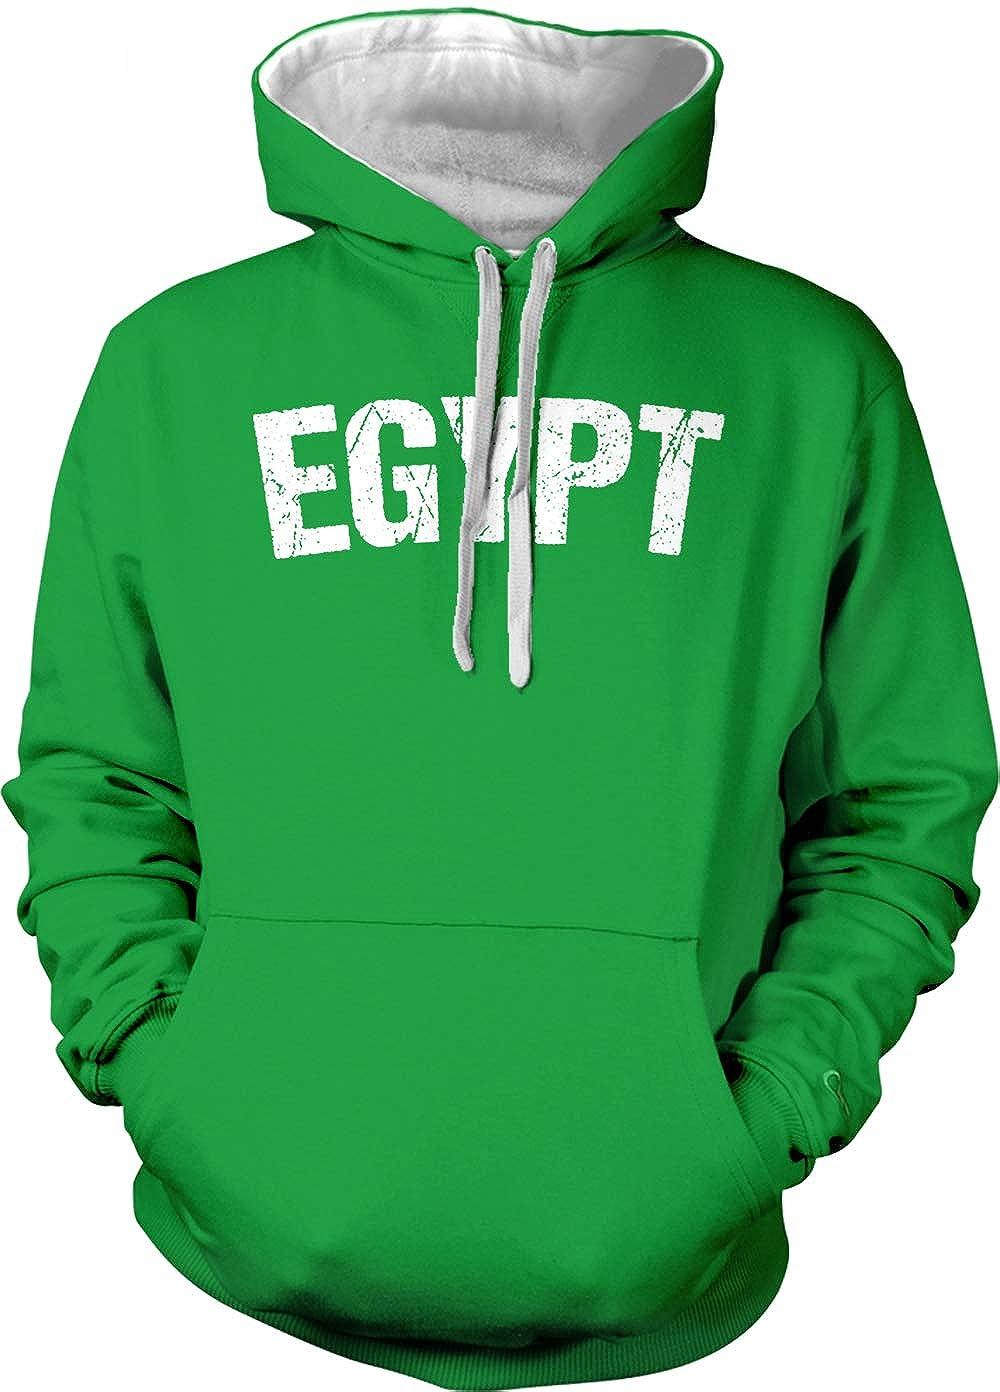 Soccer Futbol Sports Unisex Hoodie Sweatshirt Tcombo Egypt